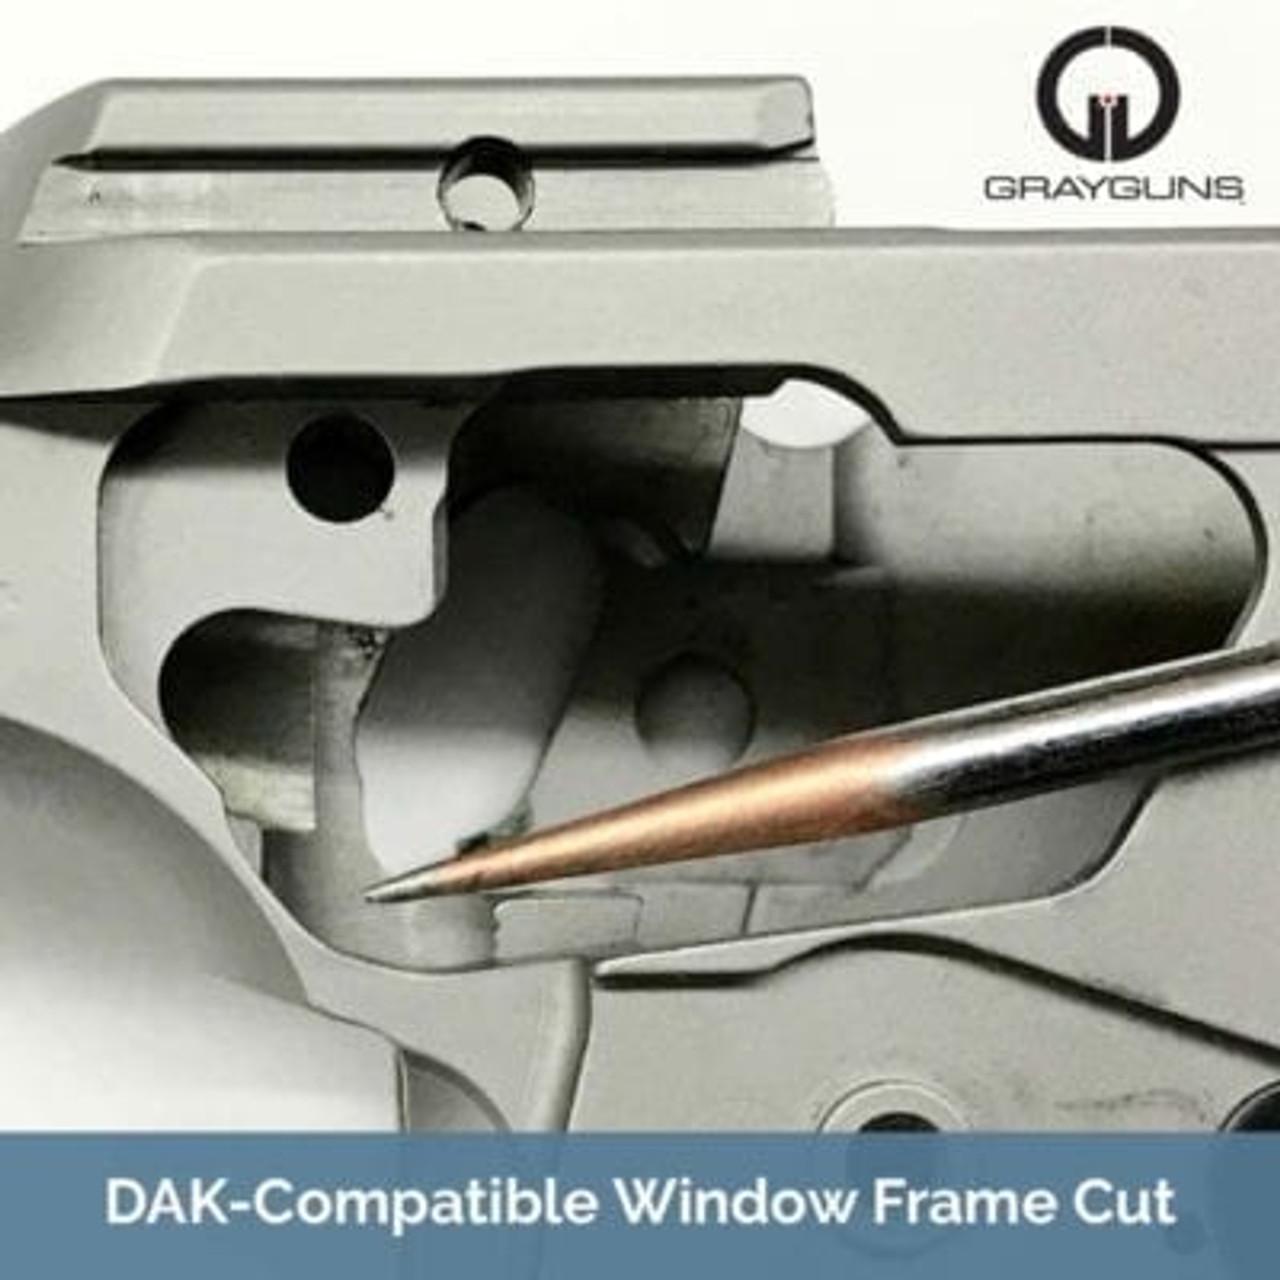 Grayguns SIG P-Series ELS (Enhanced Leverage System) Straight Trigger - DAK